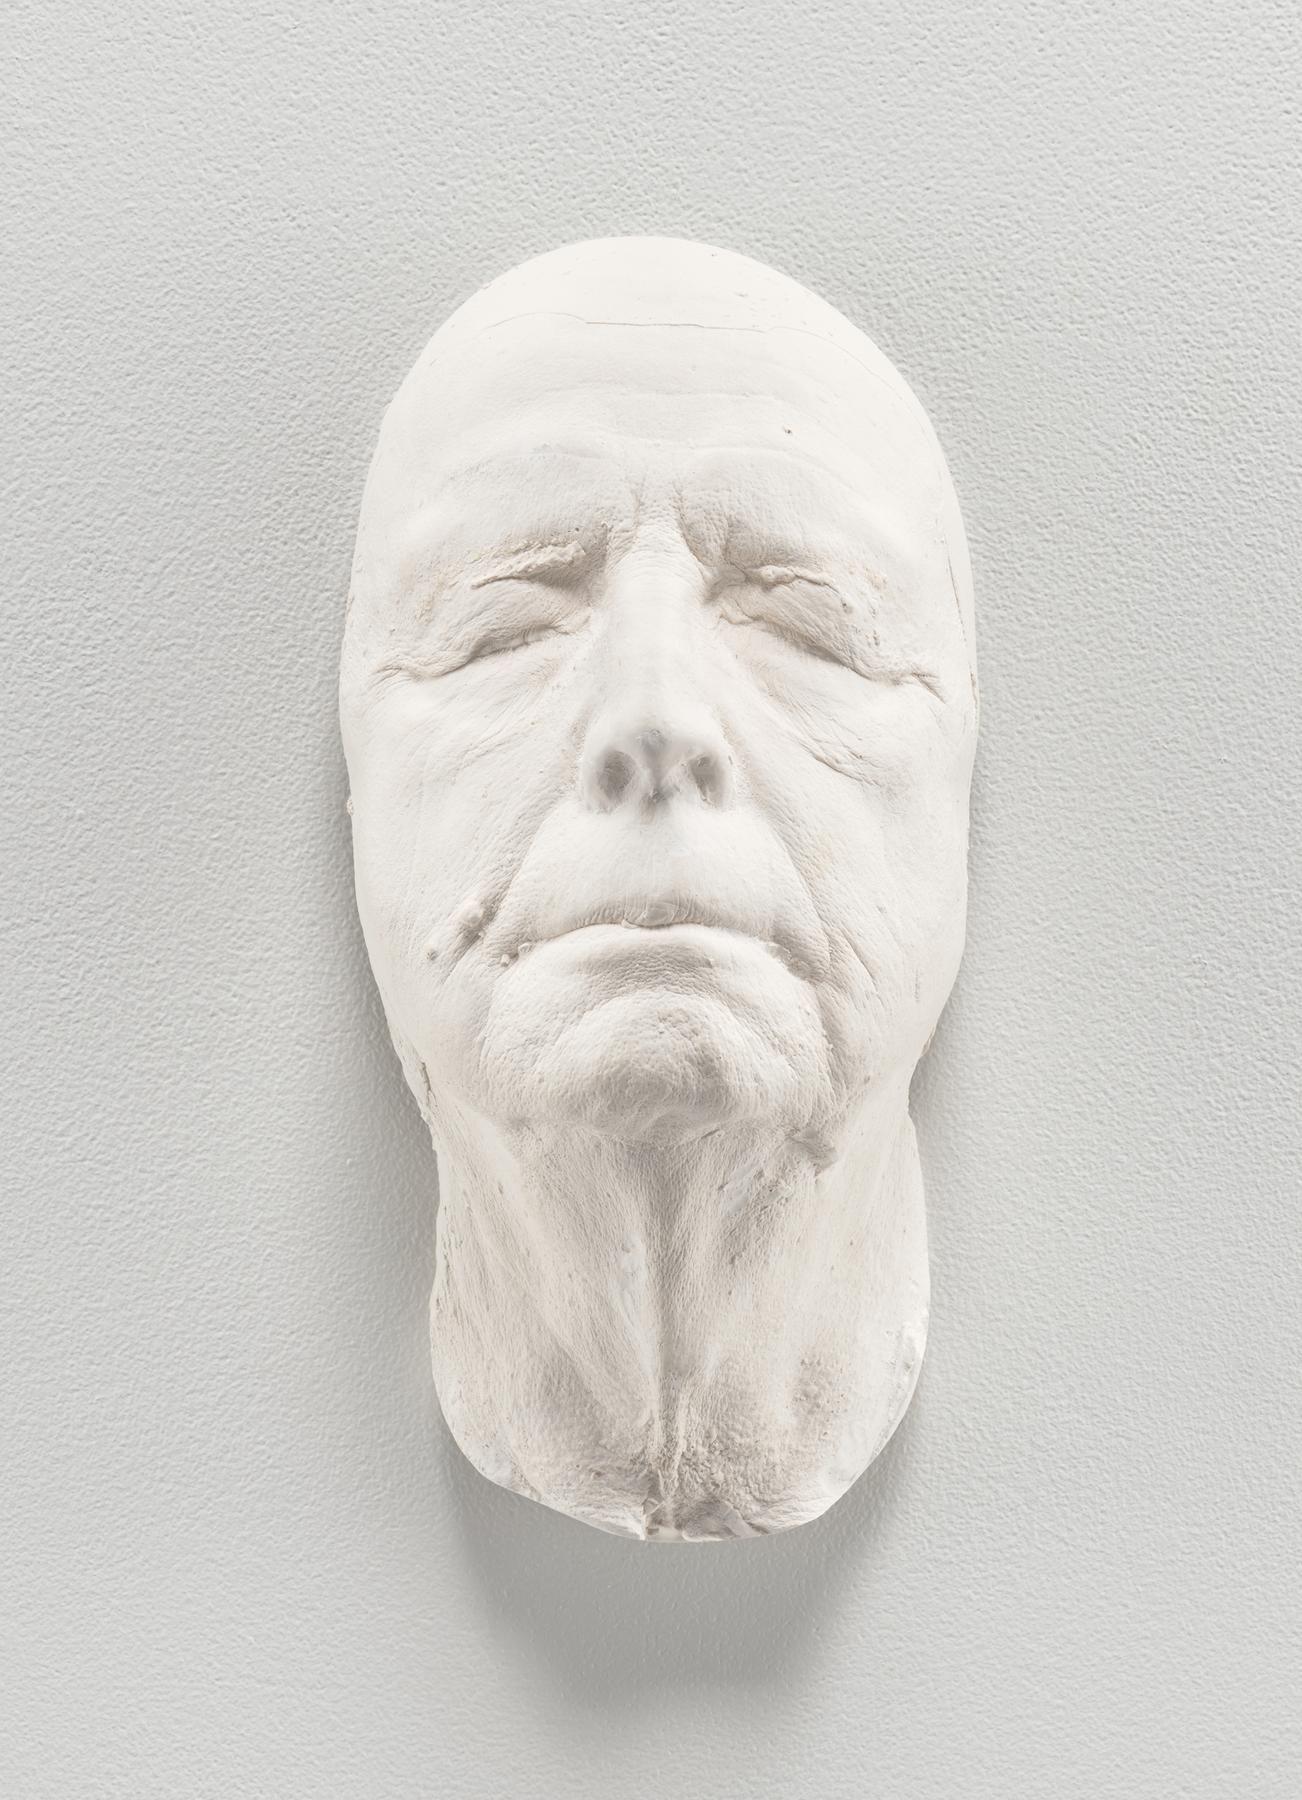 Mother Mold - Keith Edmier - Exhibitions - Petzel Gallery